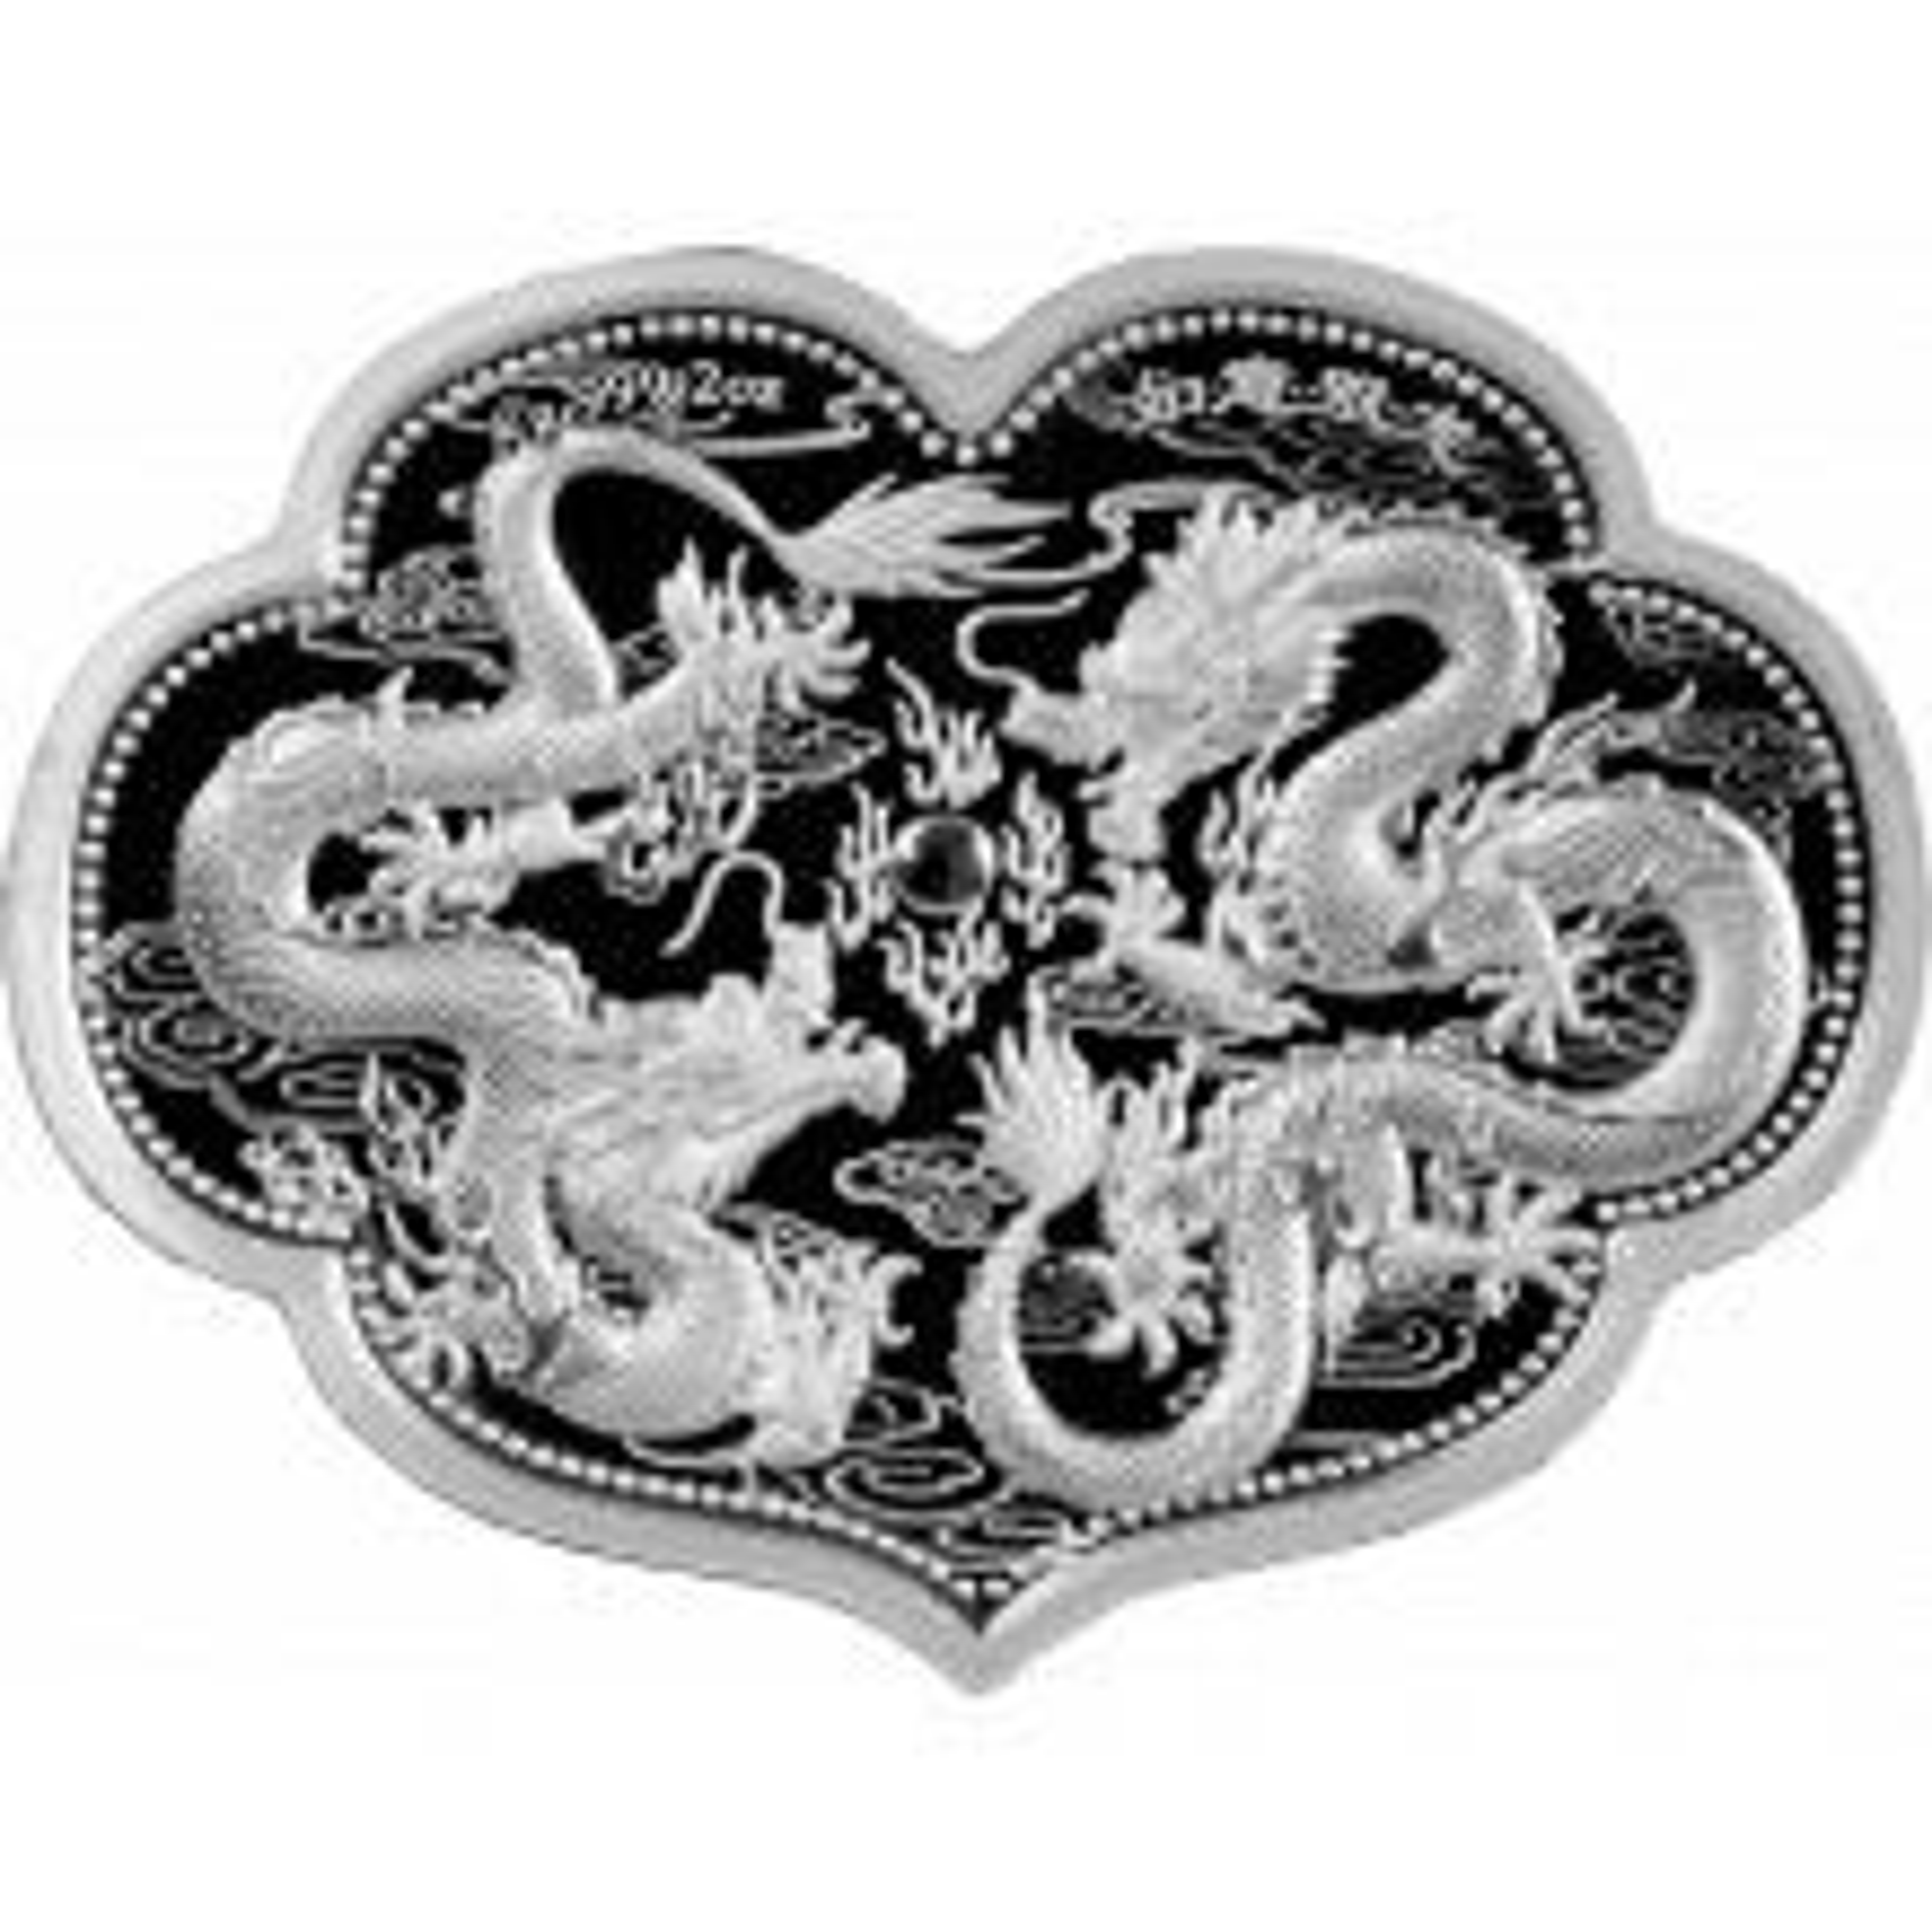 2 troy ounce zilveren munt wenselijke dubbele draak 2021